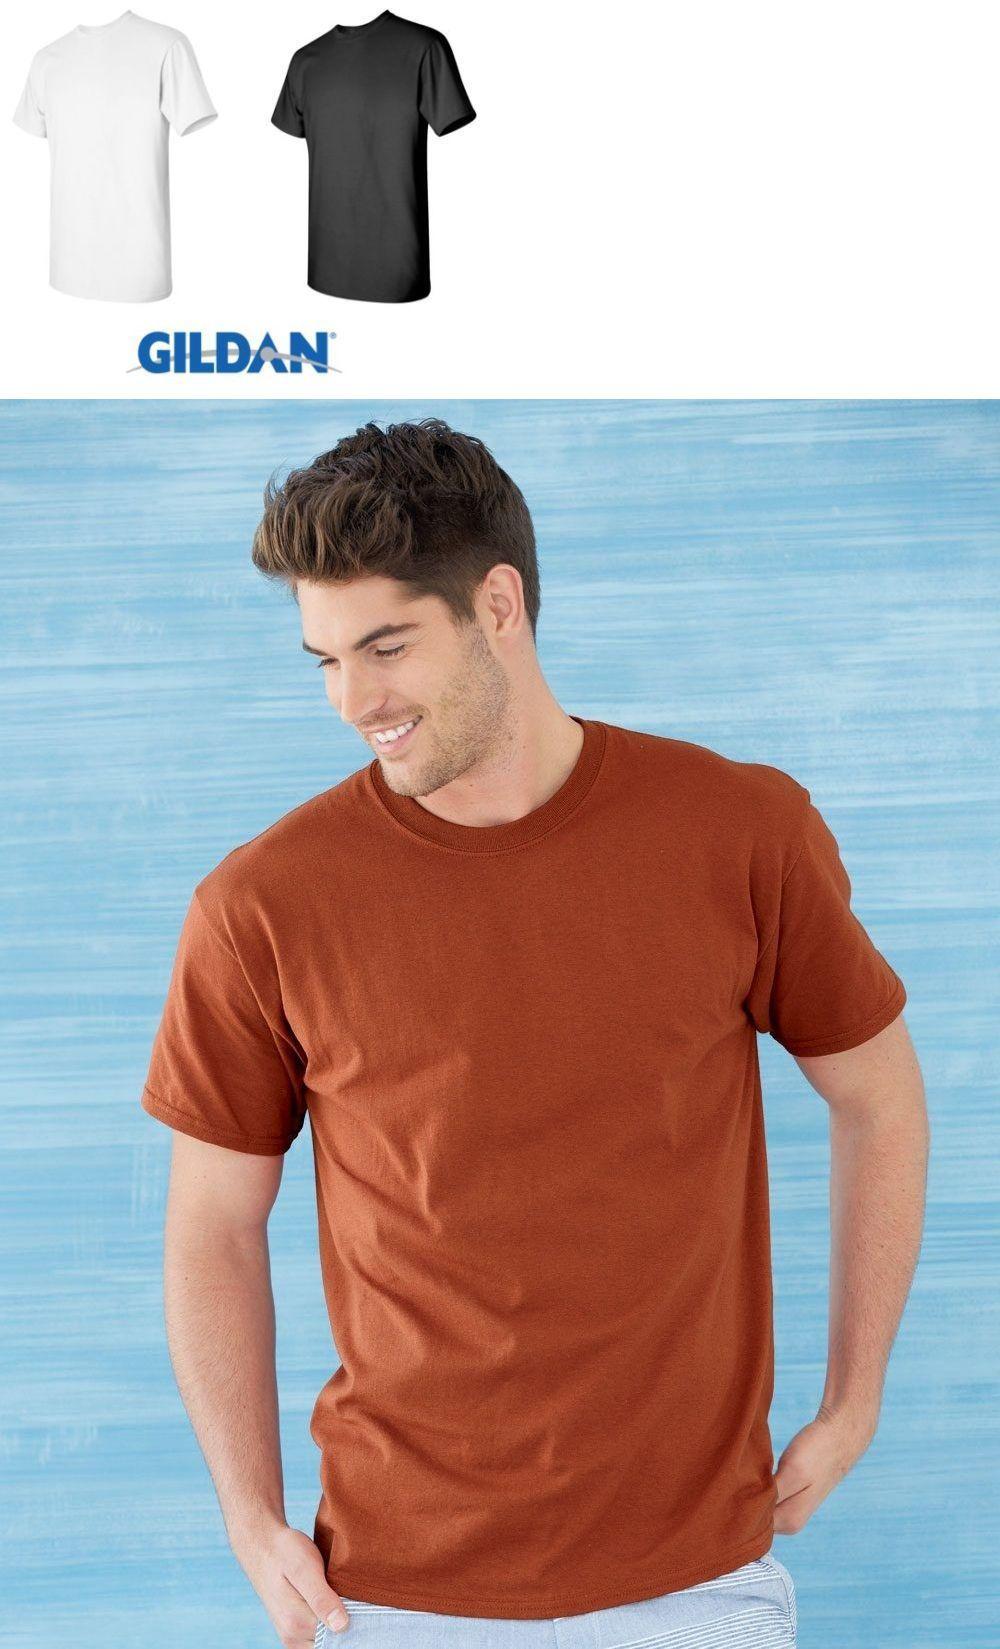 100 Gildan T SHIRT BLANK BULK LOT Black 50 Mix Match White Plain S--XL Wholesale